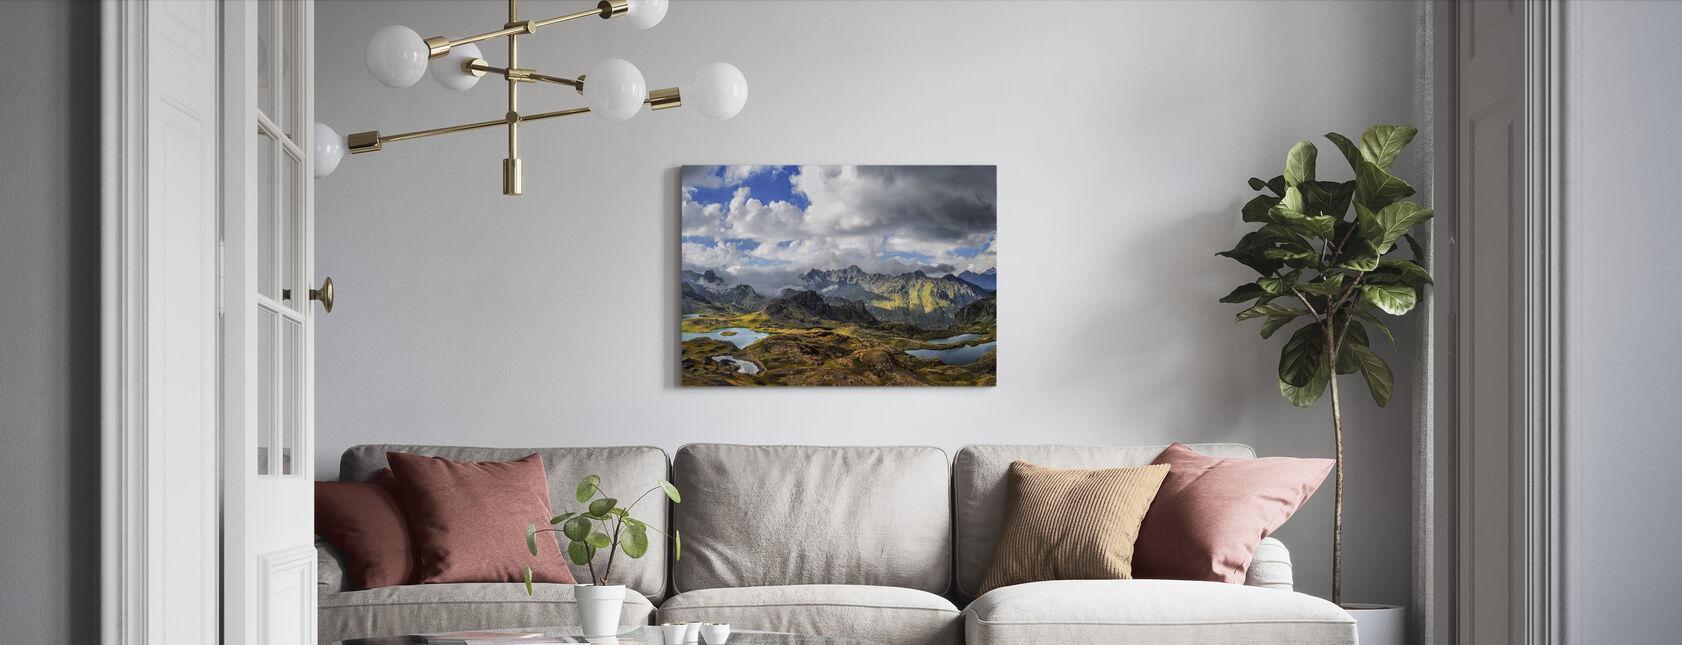 Sneeuwmeer Highlands - Canvas print - Woonkamer